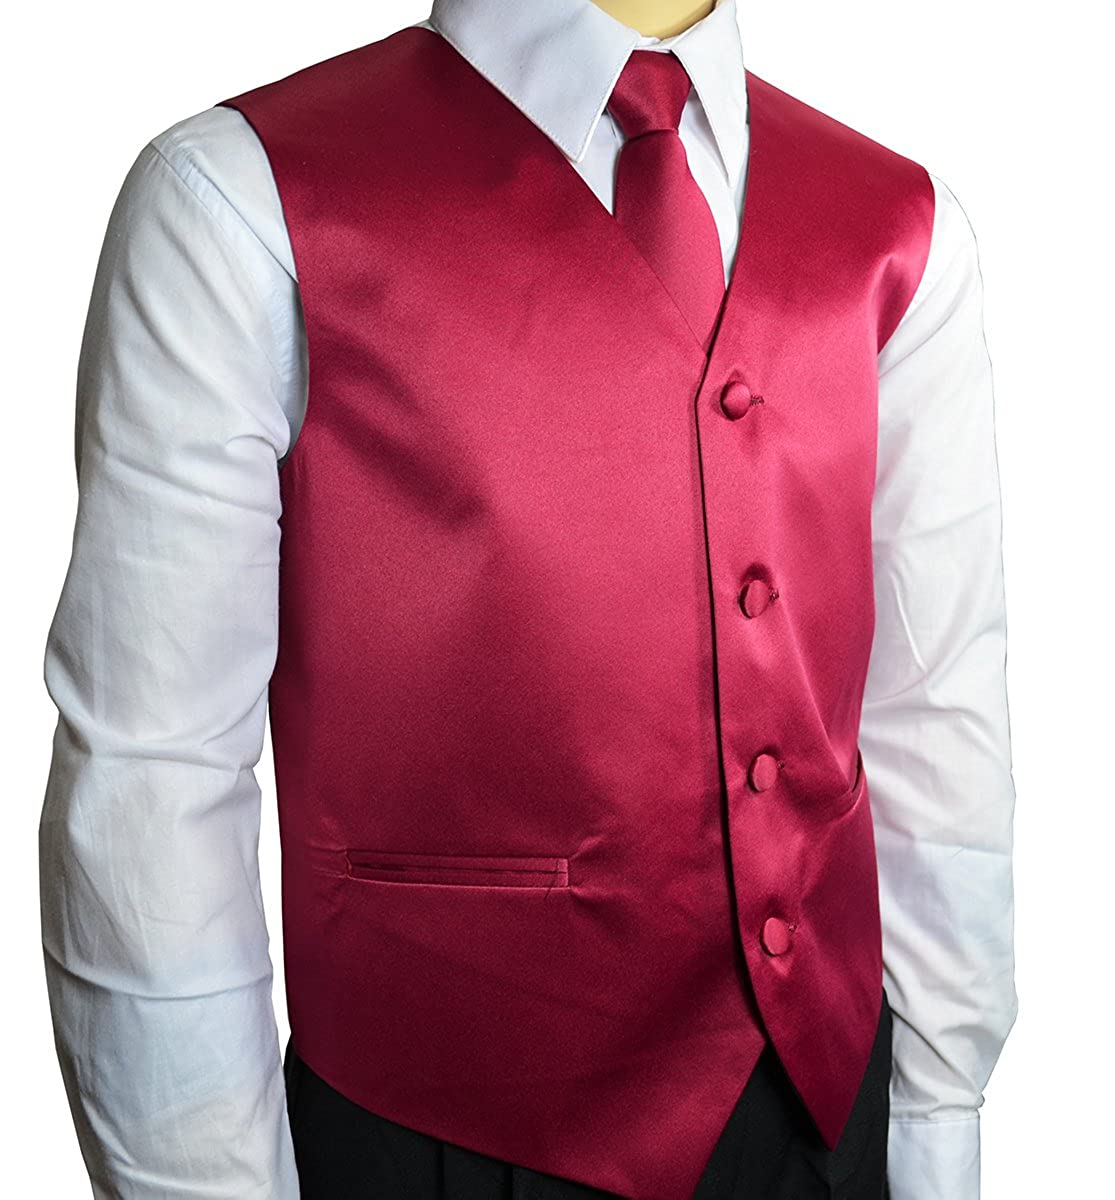 Solid Burgundy Boys Tuxedo Vest Set